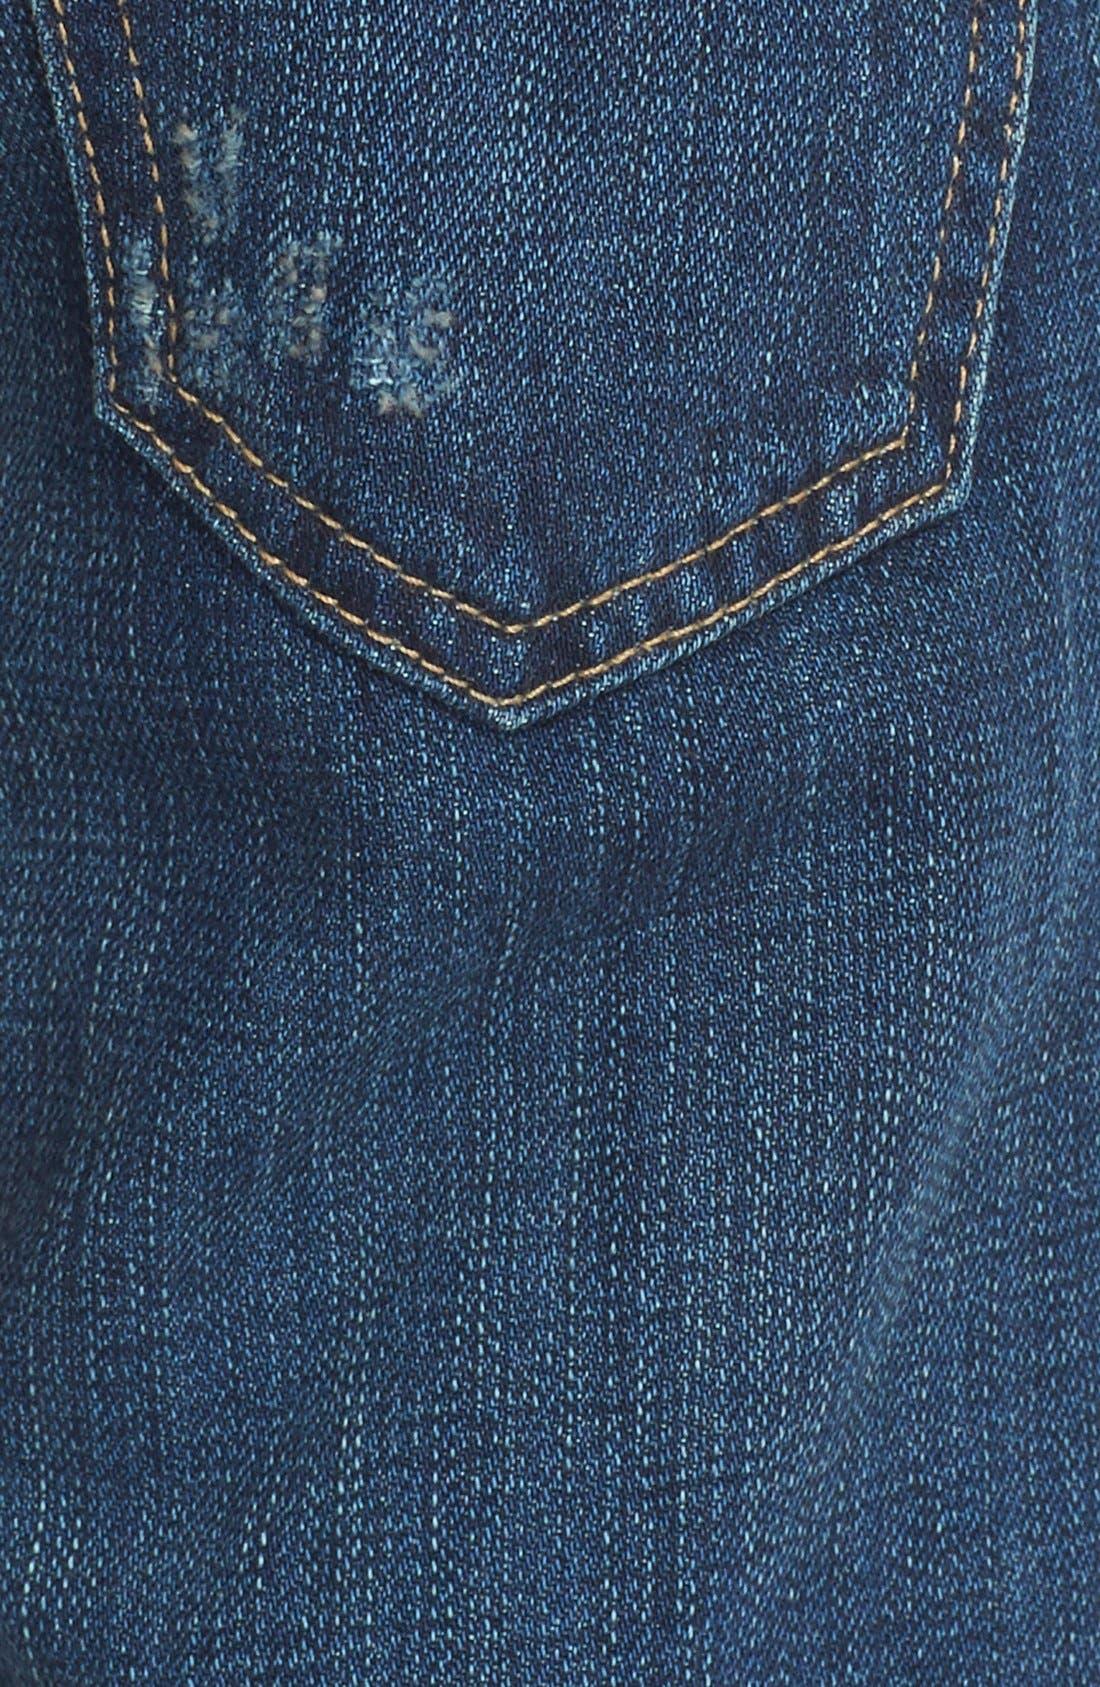 Alternate Image 5  - Current/Elliott 'The Fling' Boyfriend Jeans (Loved Destroy)